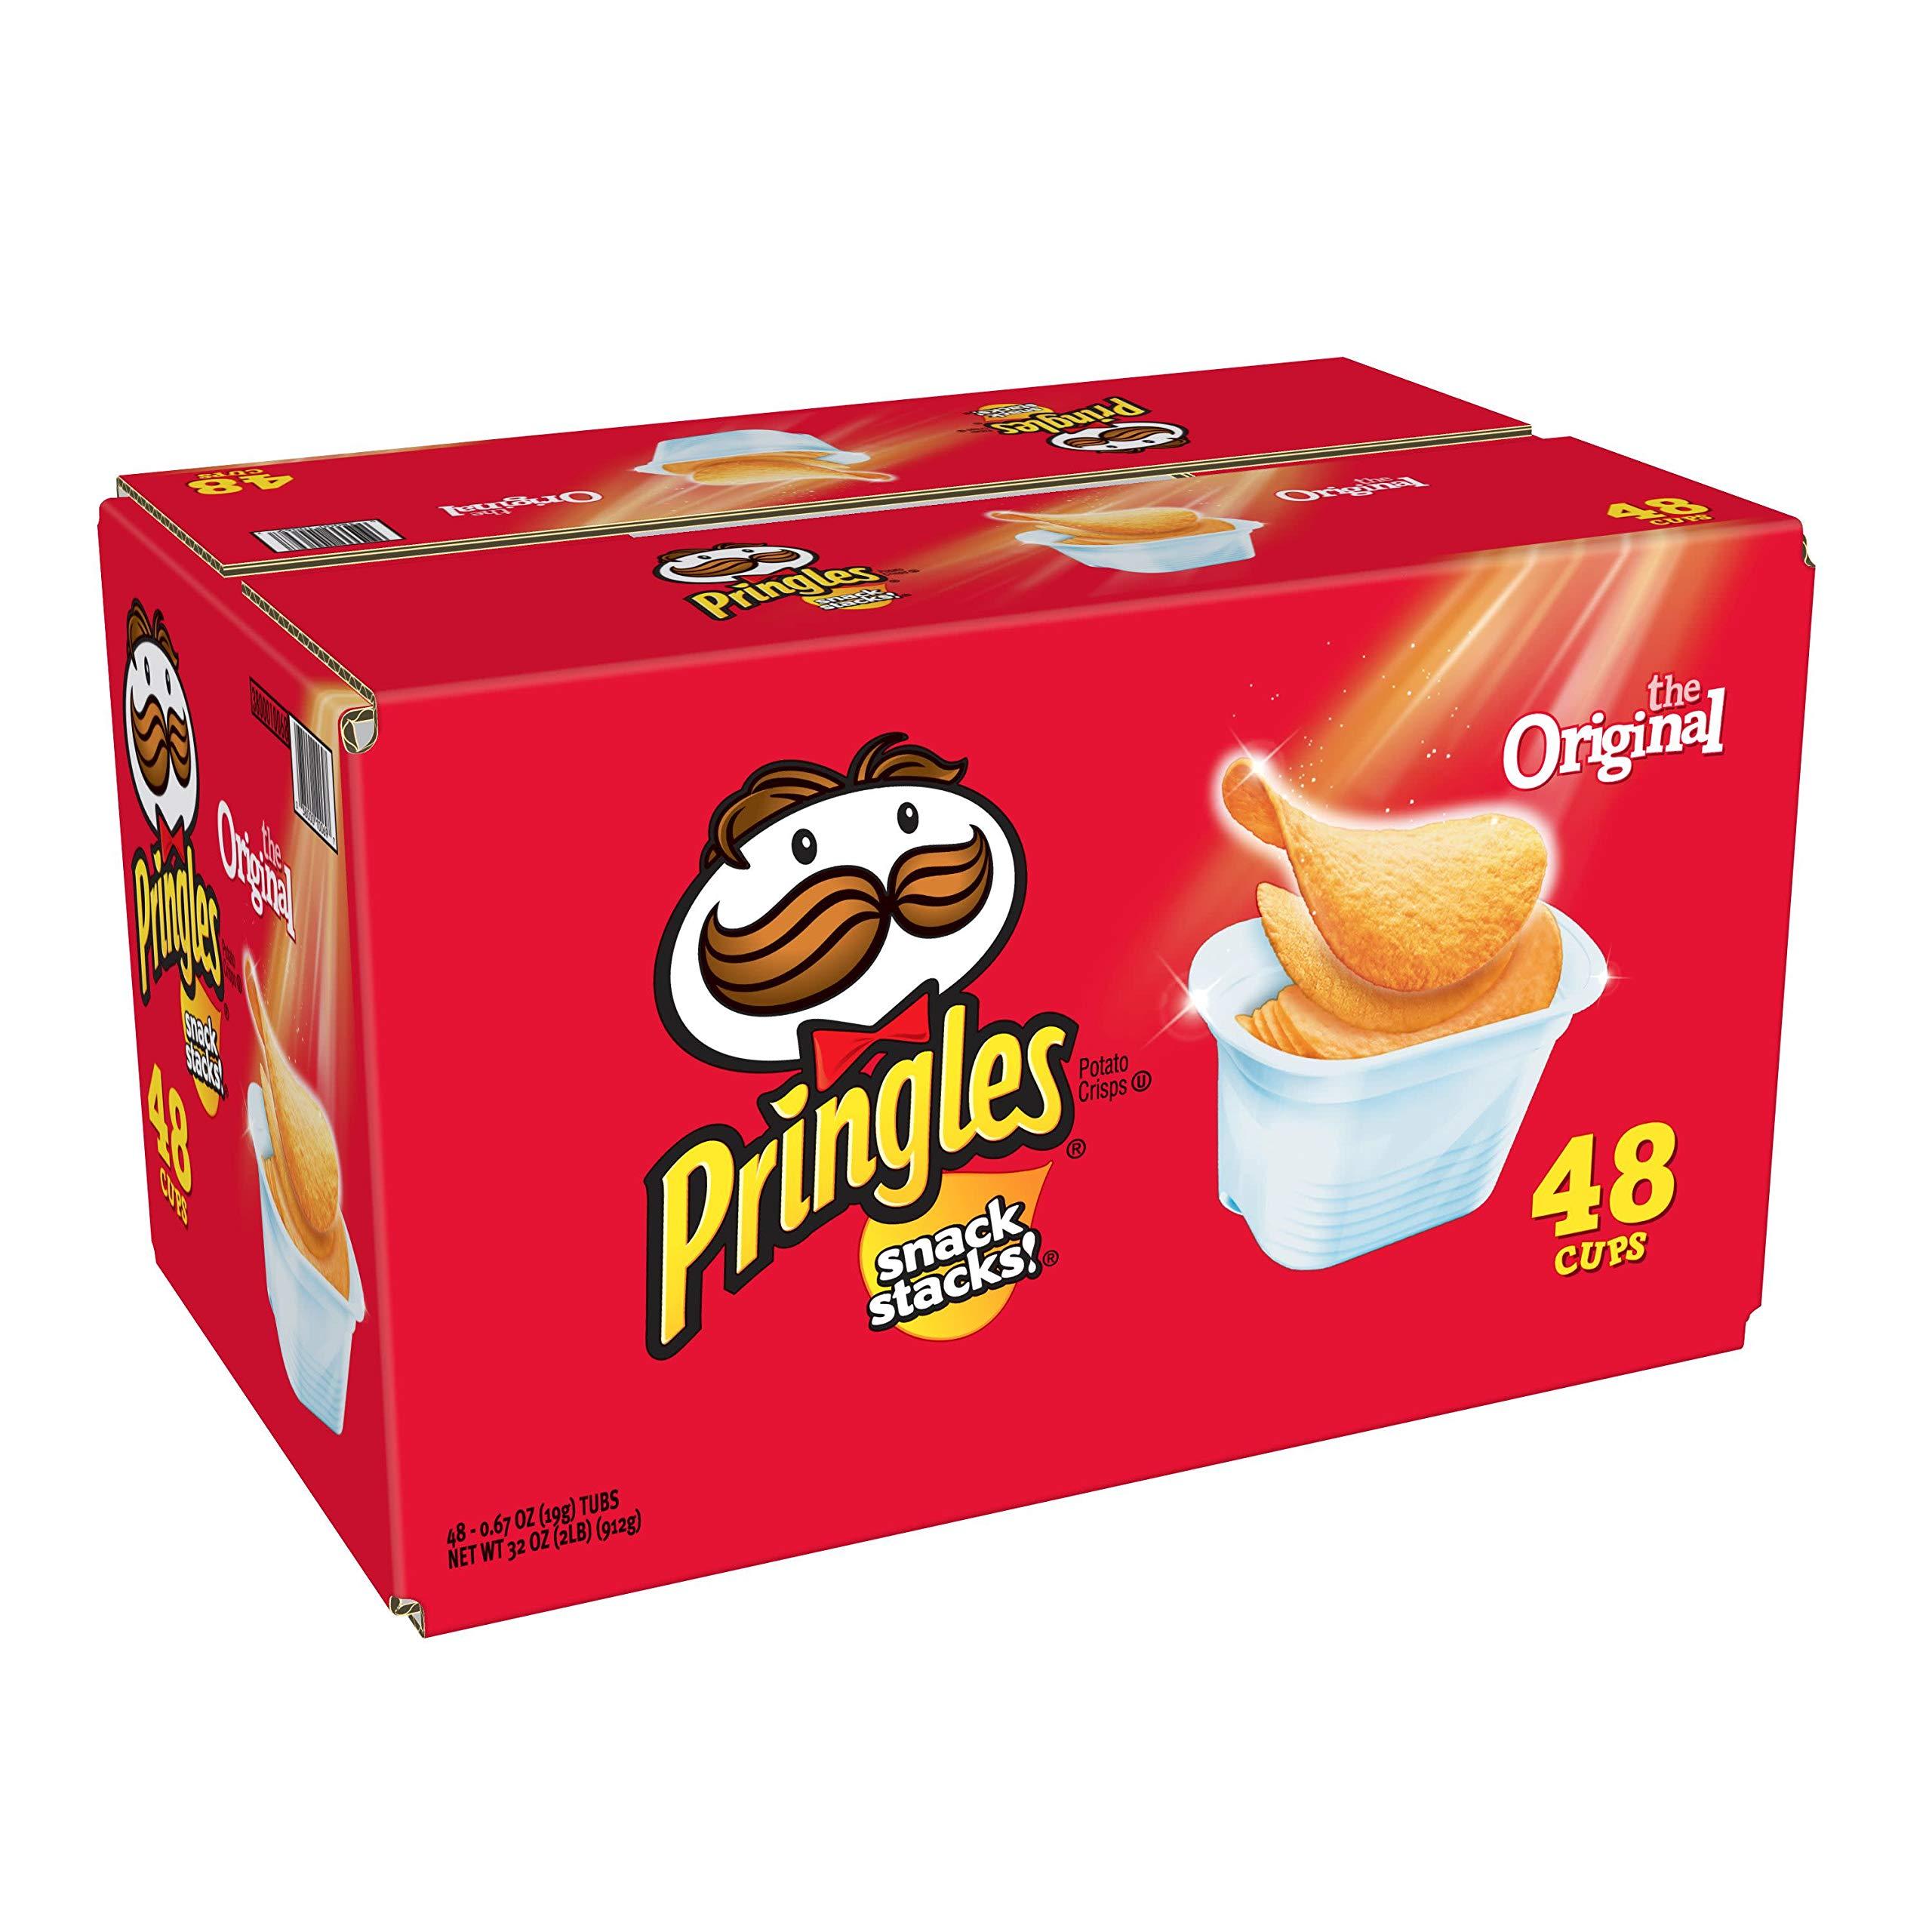 Pringles Original Snack Stacks, 32.16 Ounce, 48 count